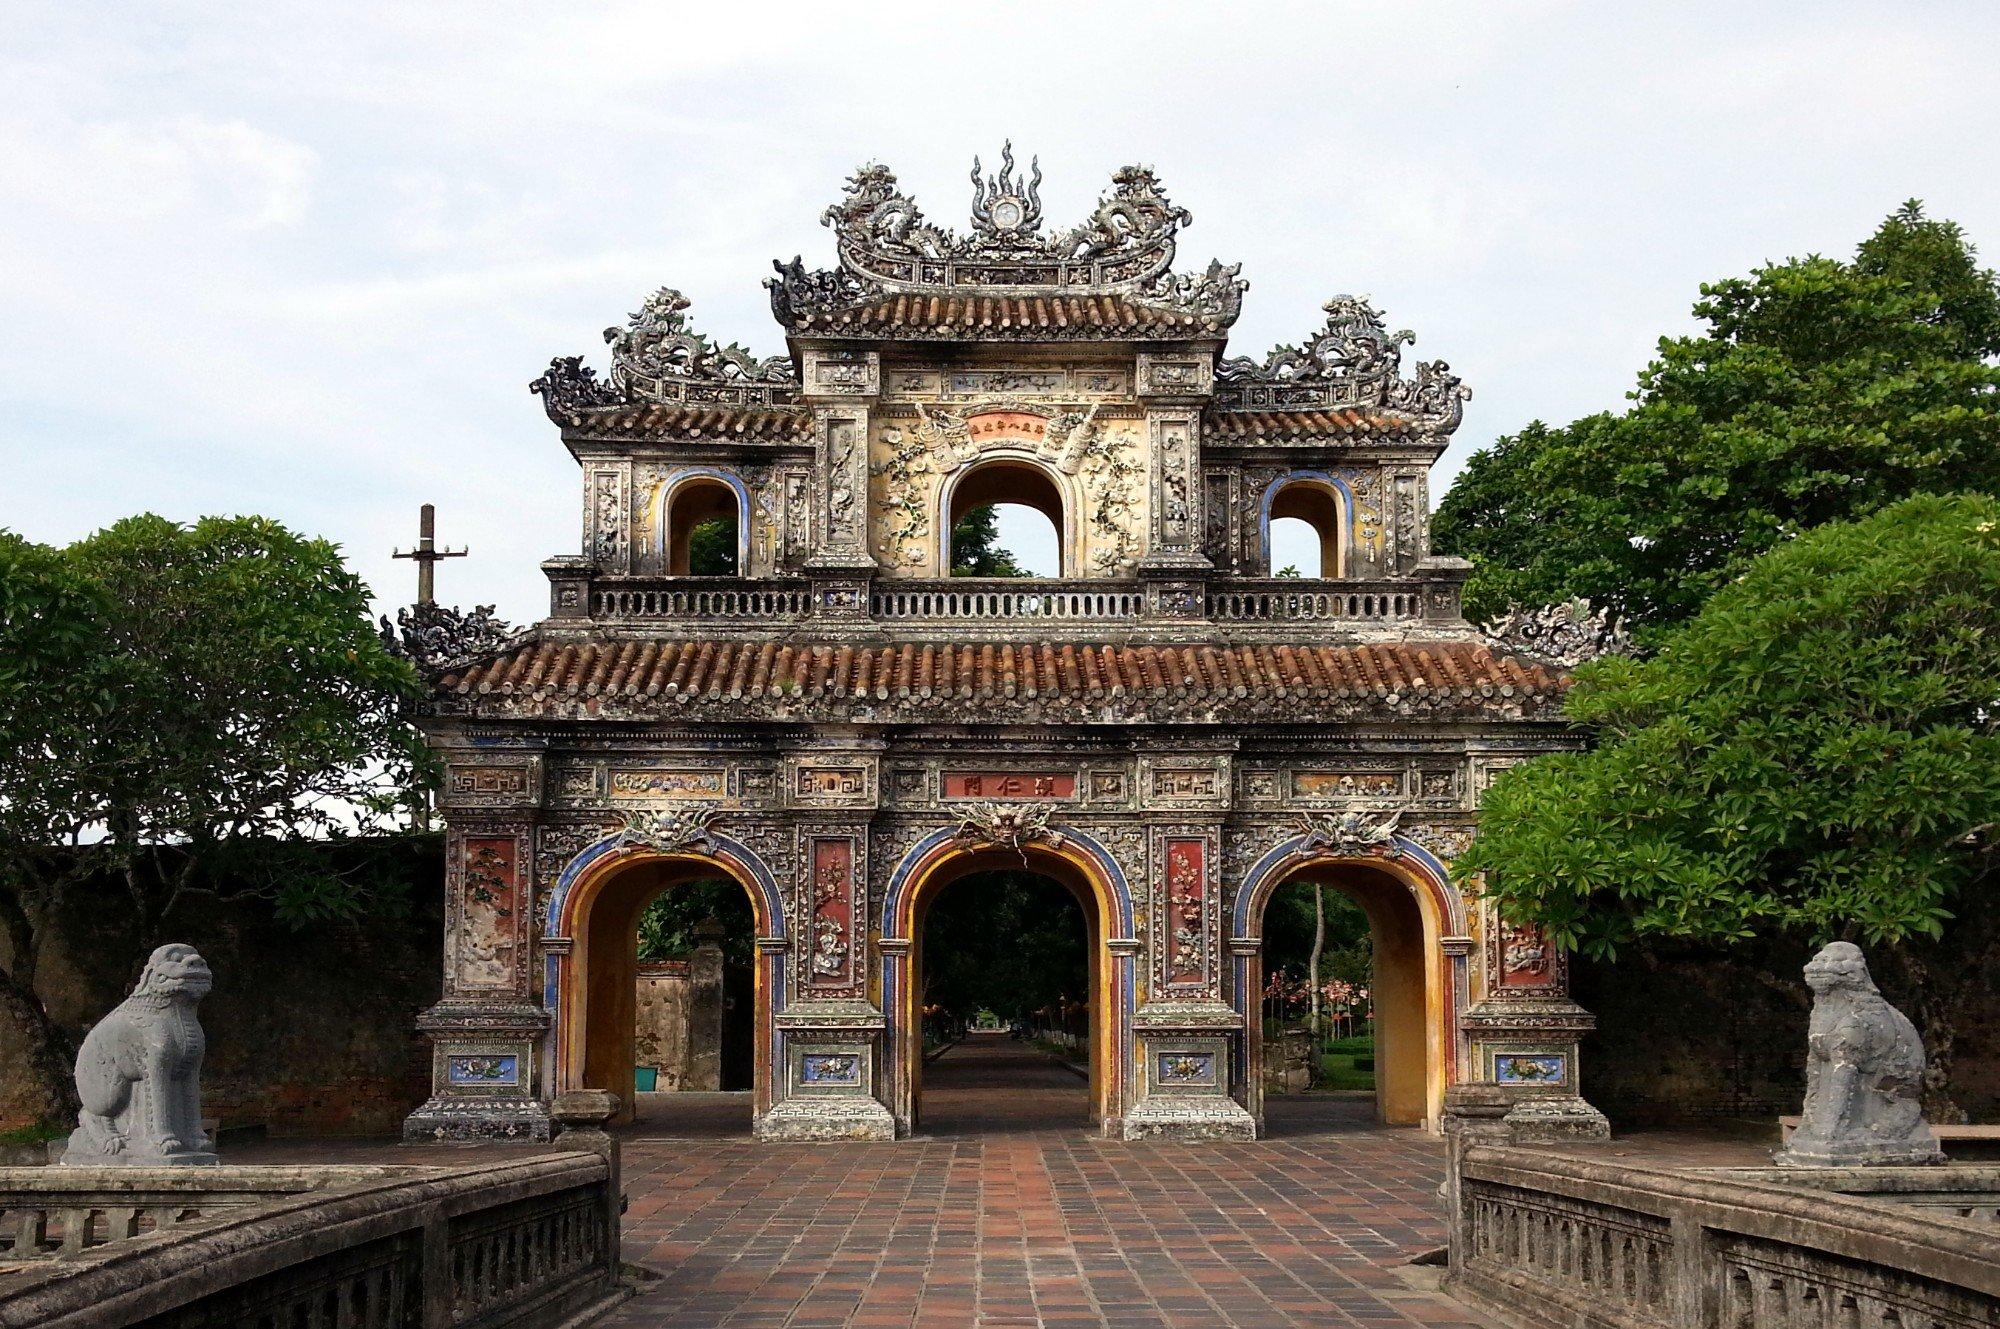 Imperial Citadel in Hue